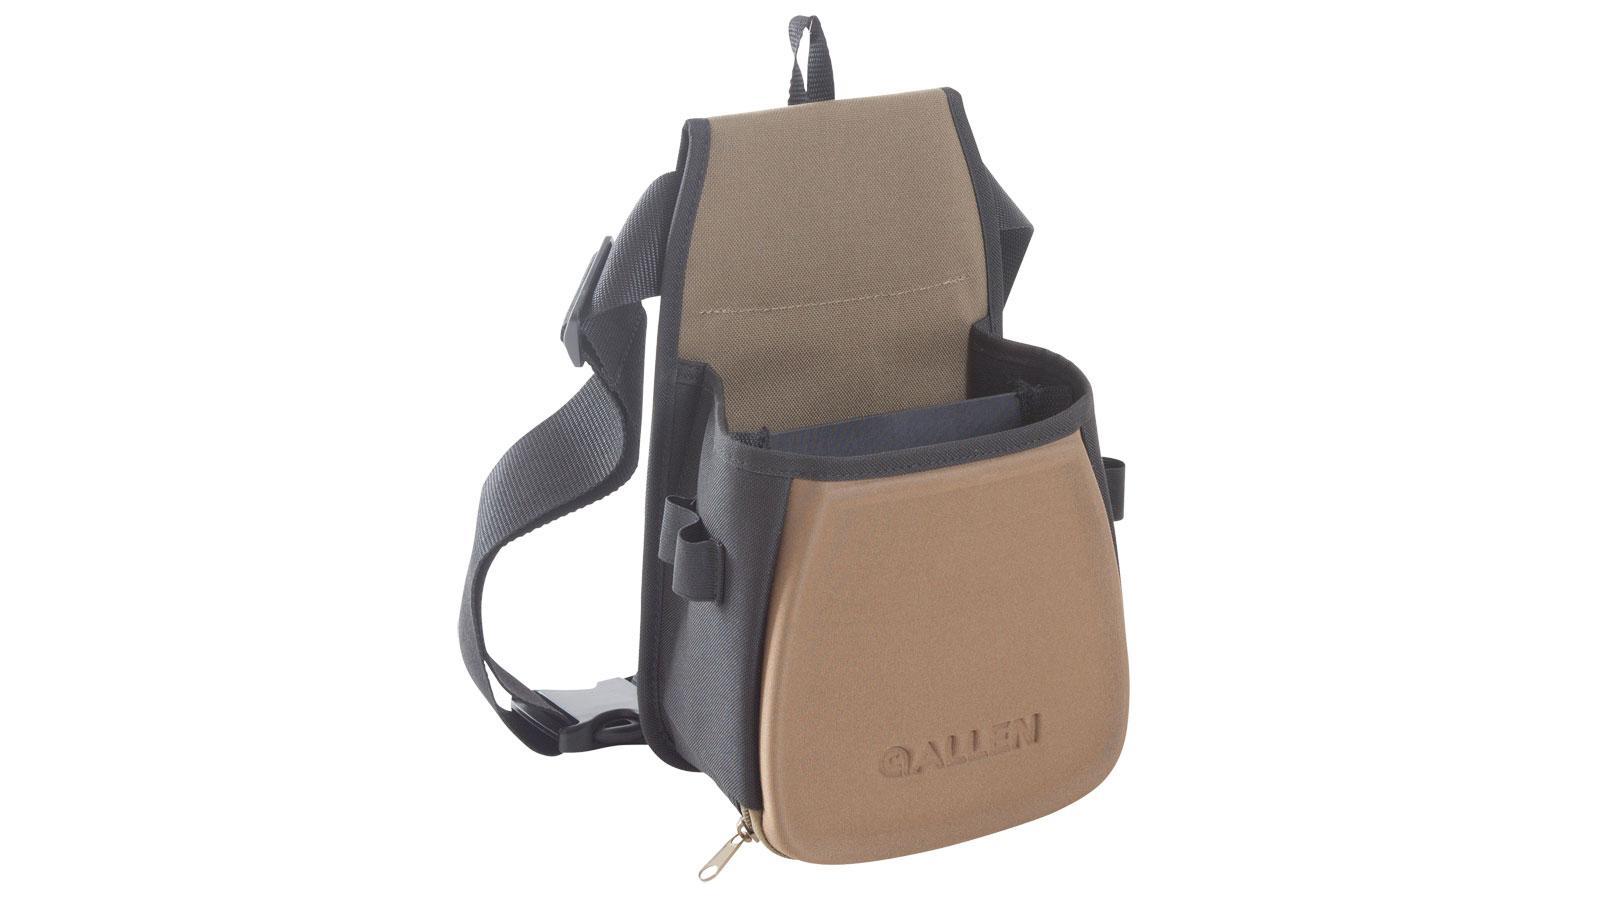 Allen ELIMINATOR BASIC RANGE BAG